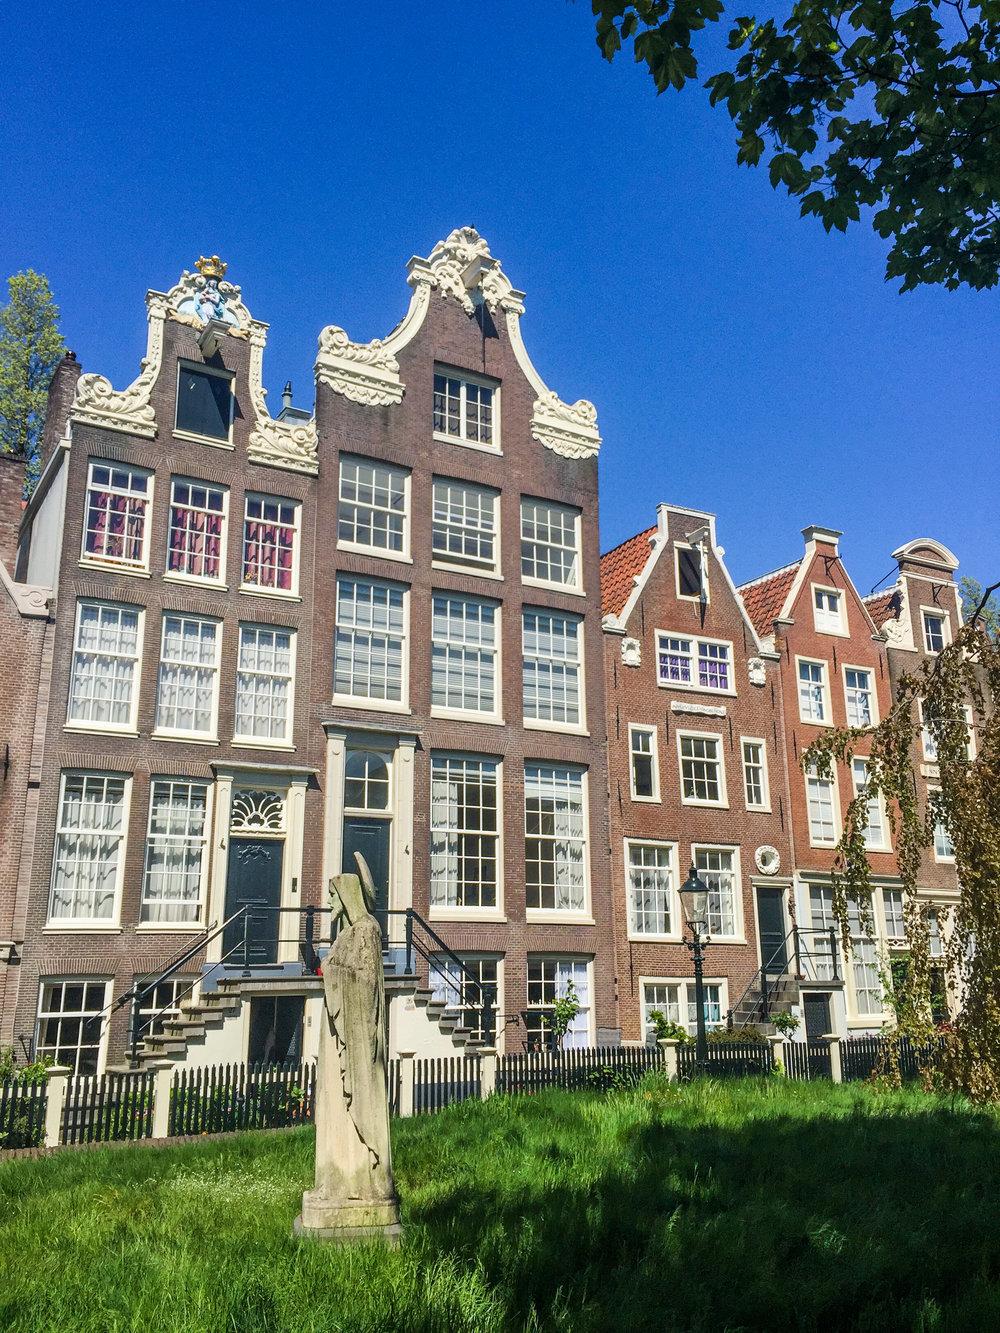 LilyHeaton_Begijnhof_Amsterdam.jpg